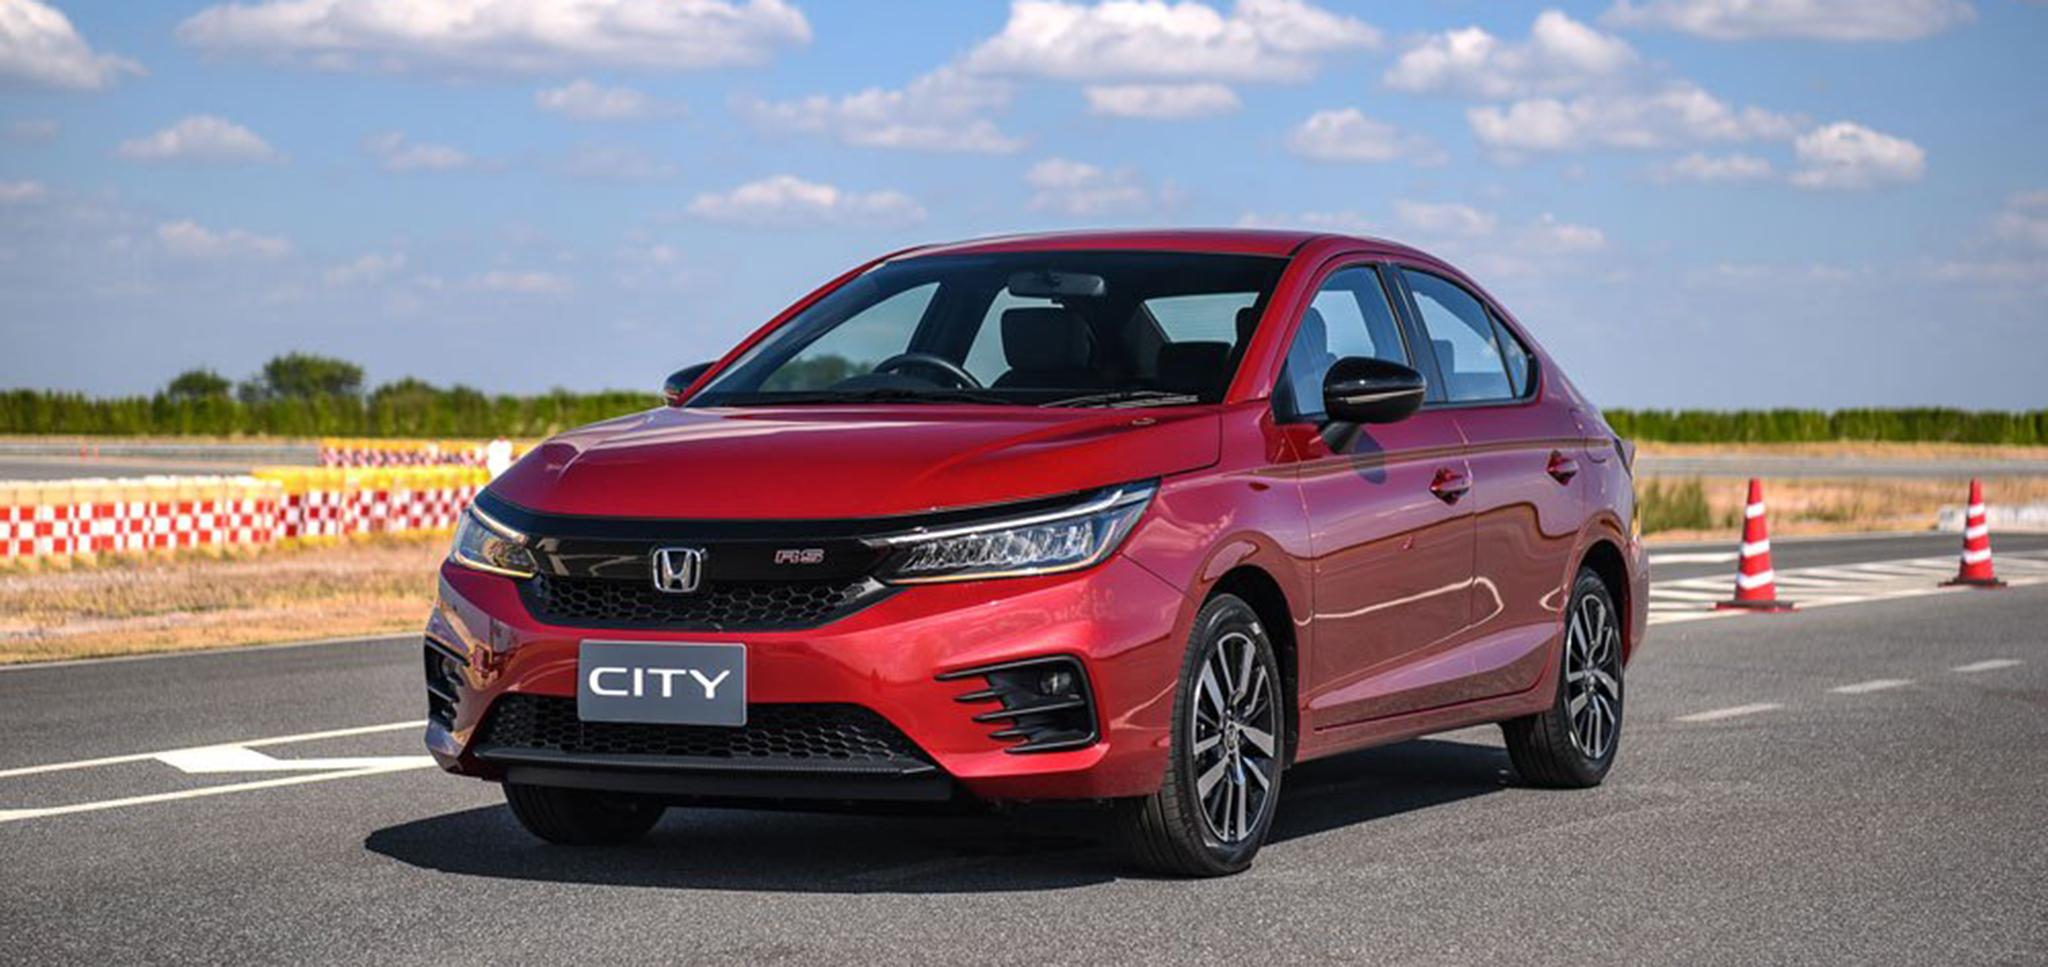 Giá xe Honda City